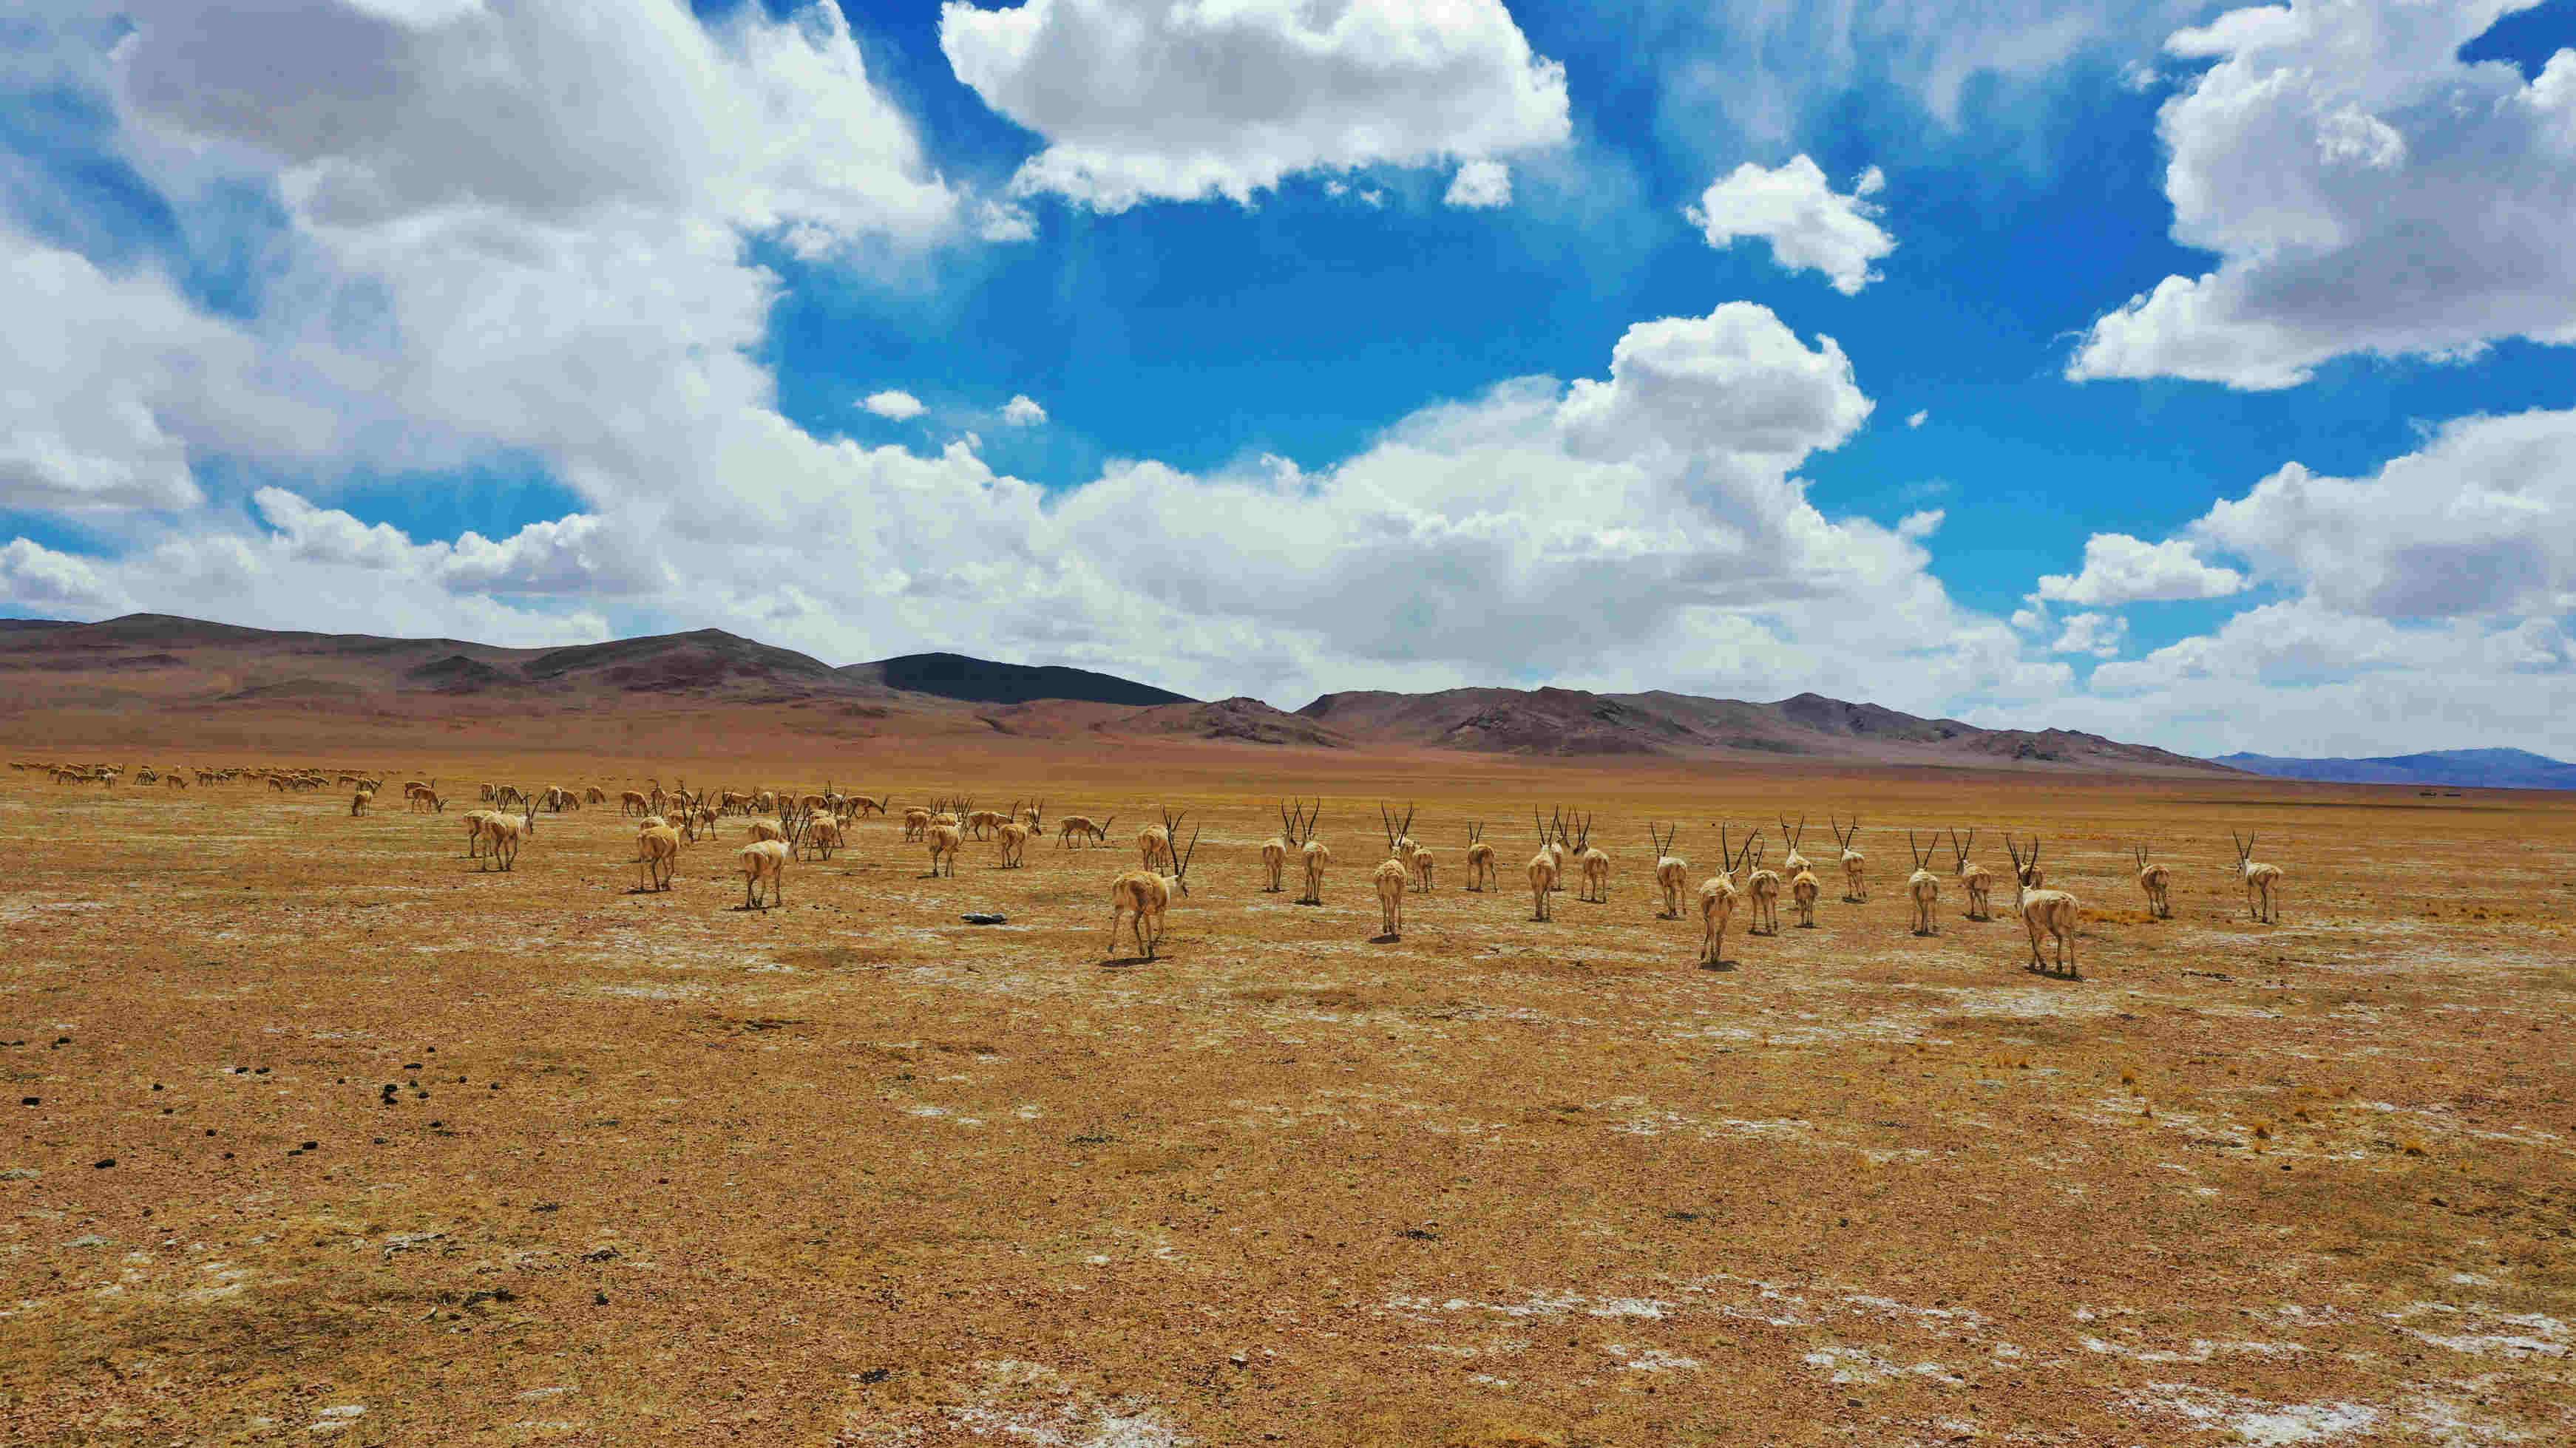 Large number of Tibetan antelopes found migrating in Tibet